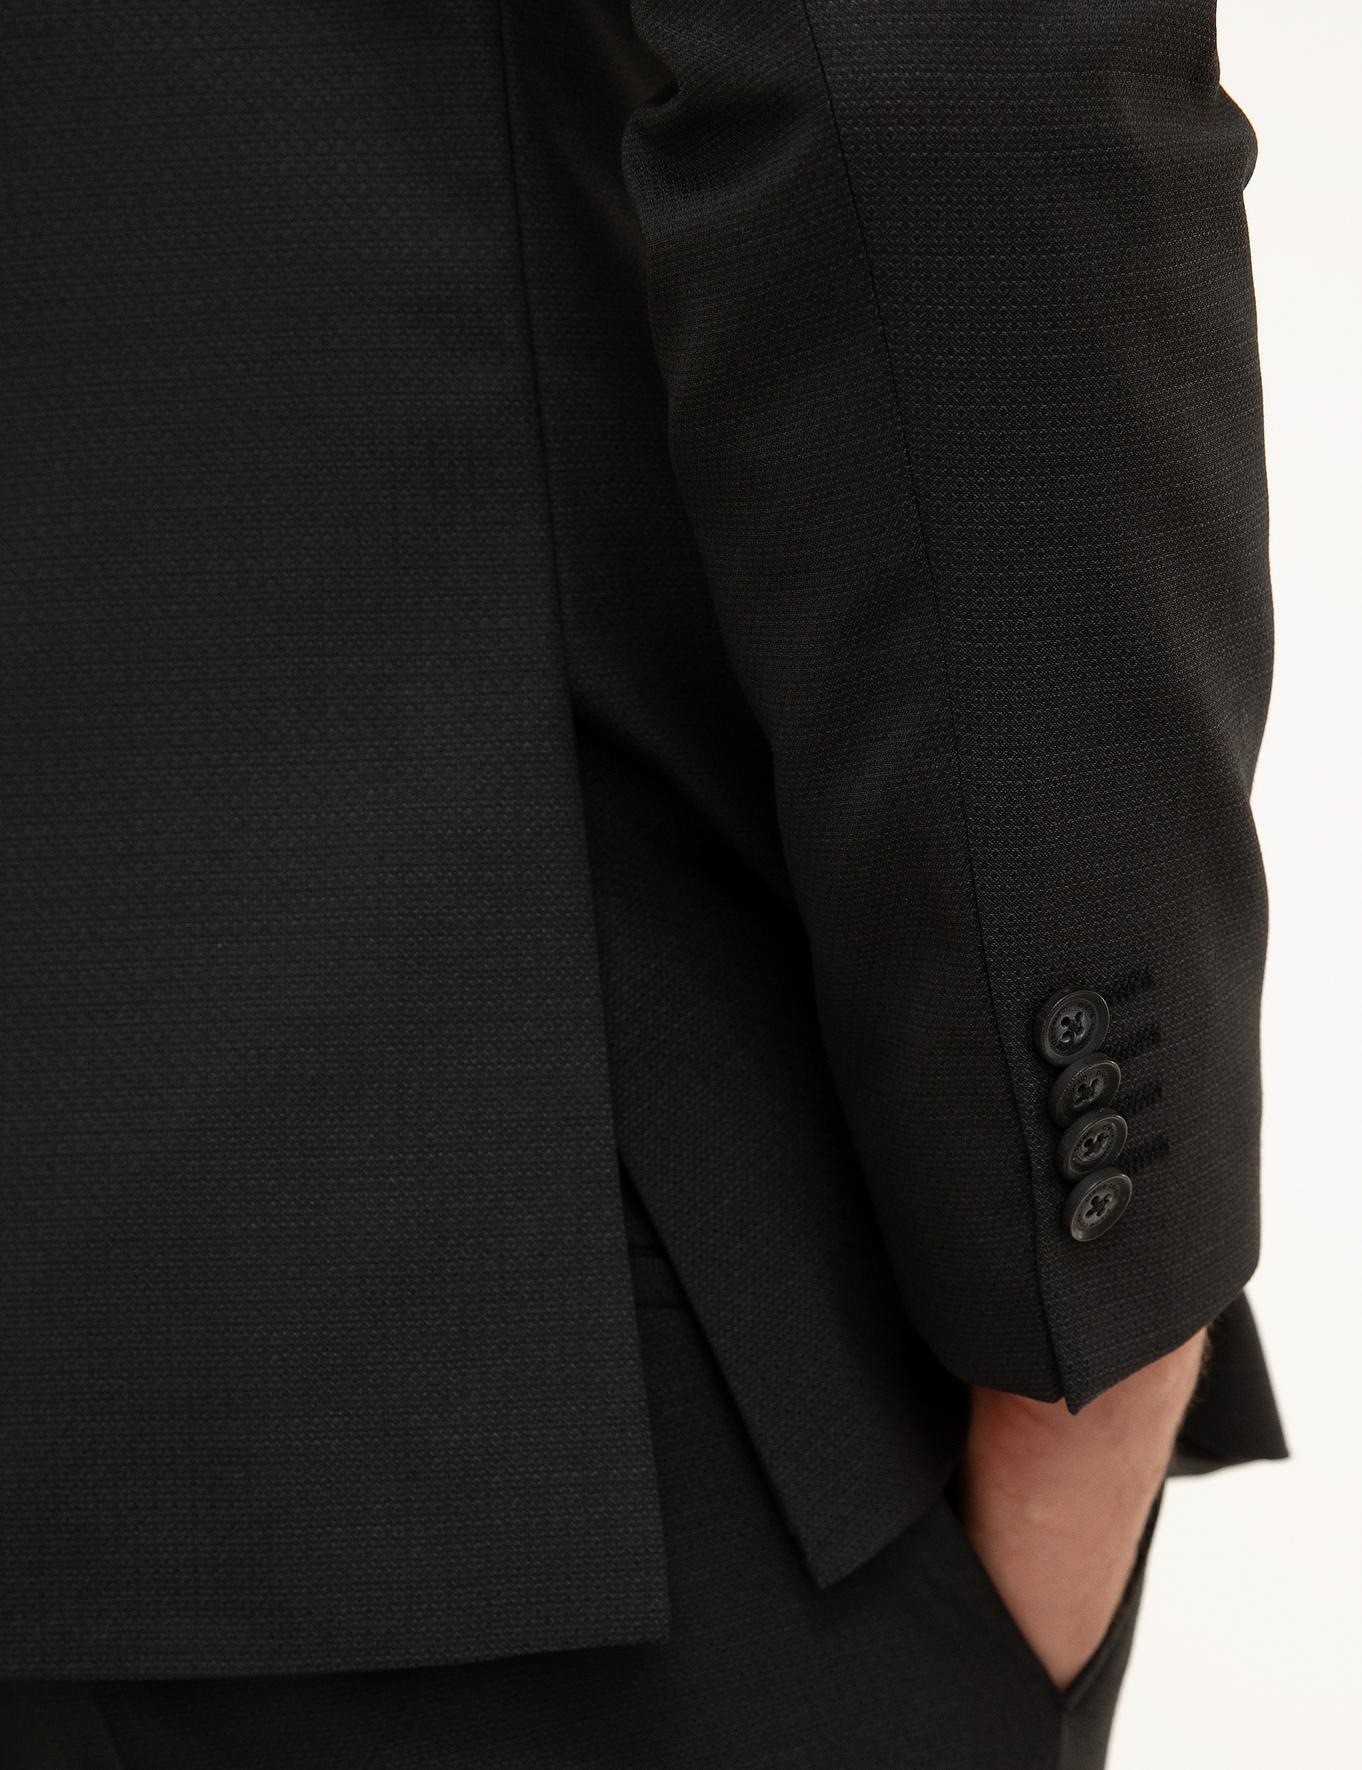 Siyah Takım Elbise